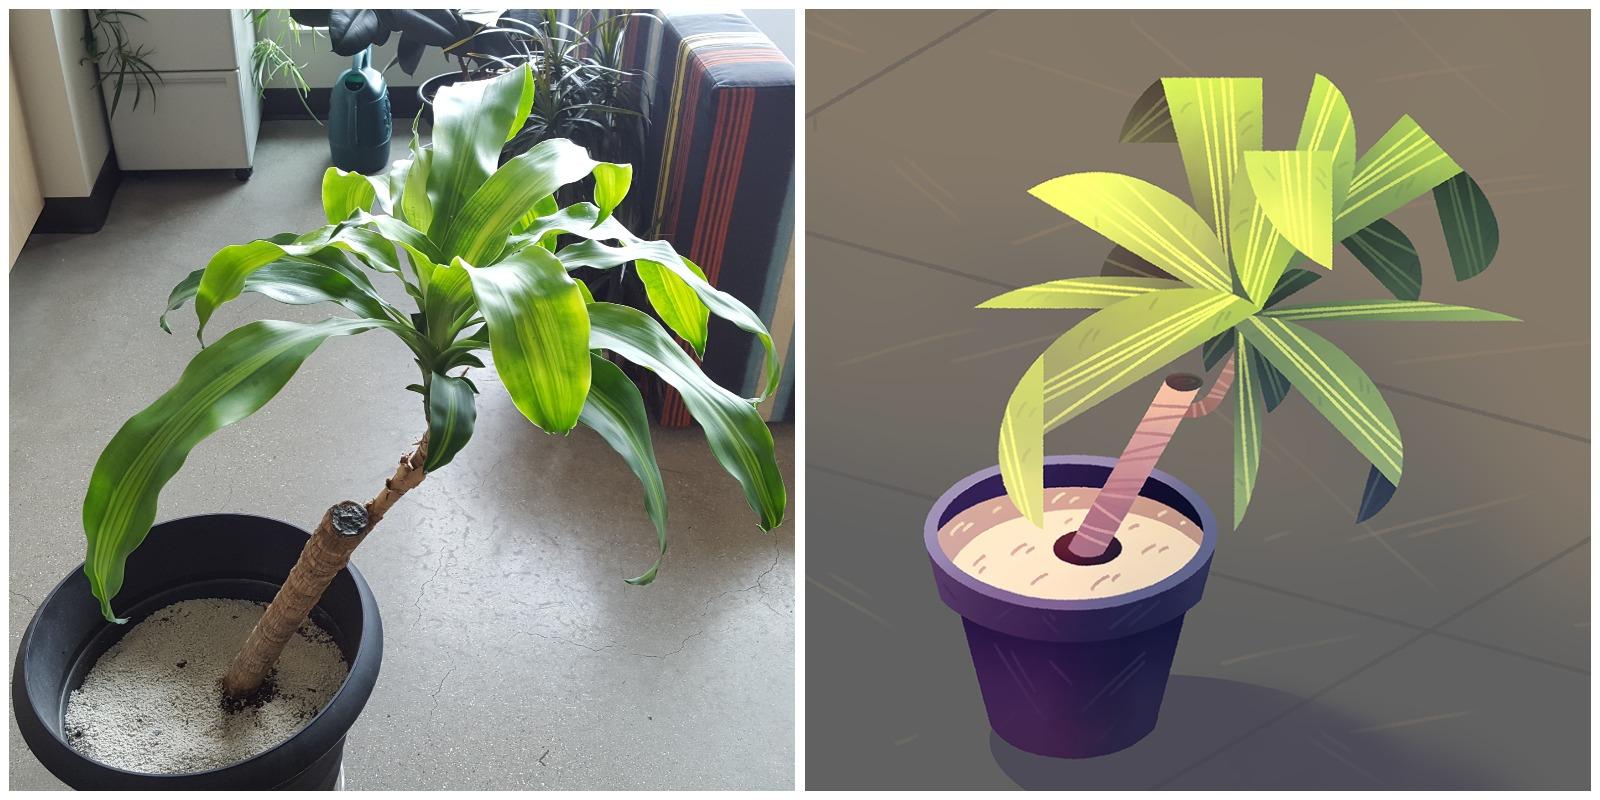 Corn Plant - Dracena fragrans